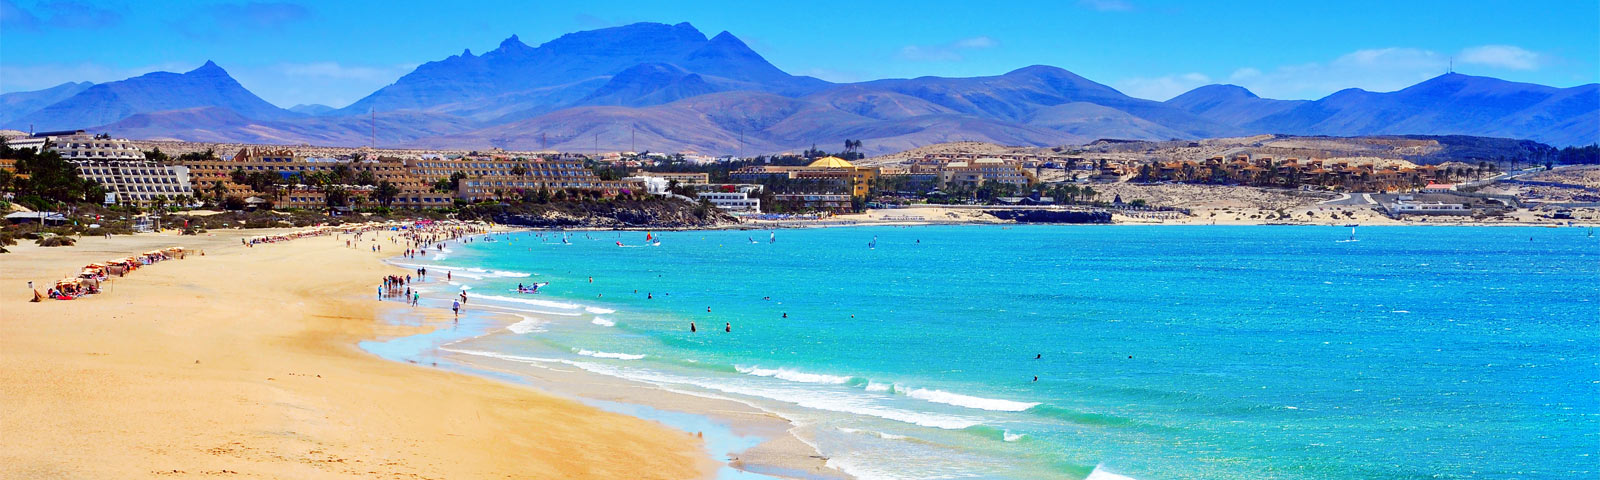 Fuerteventura Spain  City new picture : Sheraton Fuerteventura Beach, Golf and Spa Resort | Spain